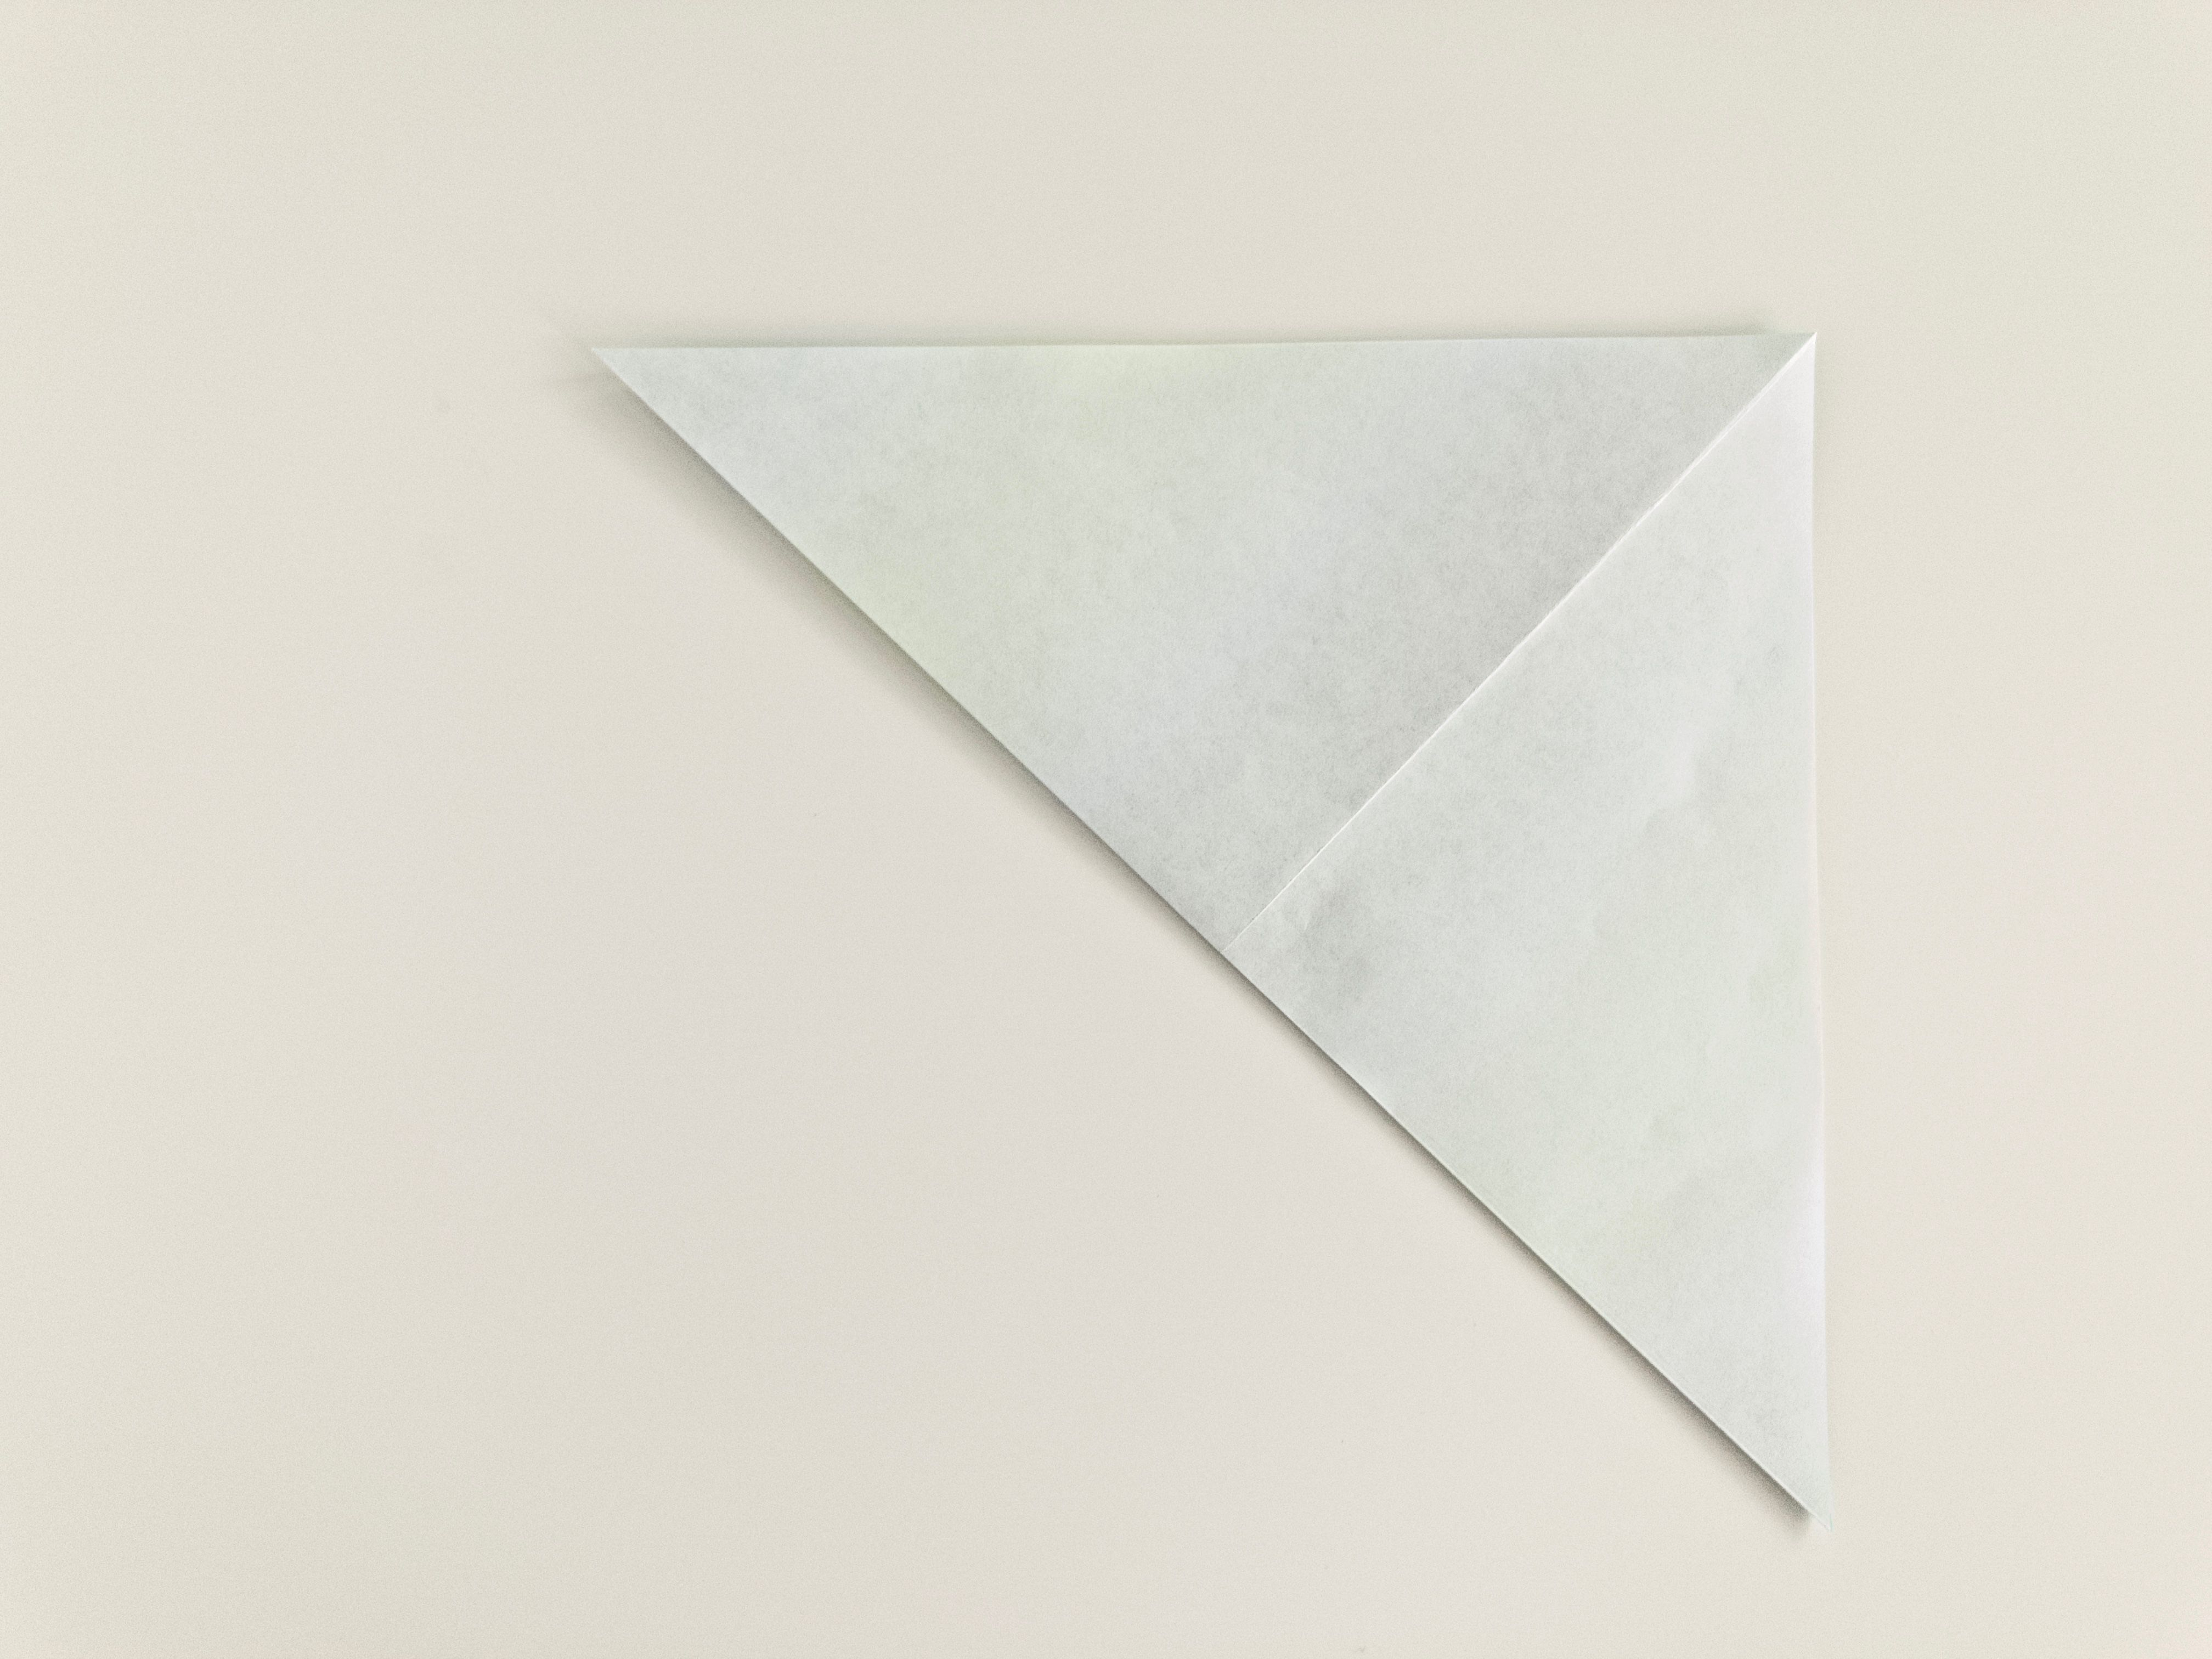 Origami: Crane Envelope / Tsuru Envelope - Instructions in English ... | 3024x4032